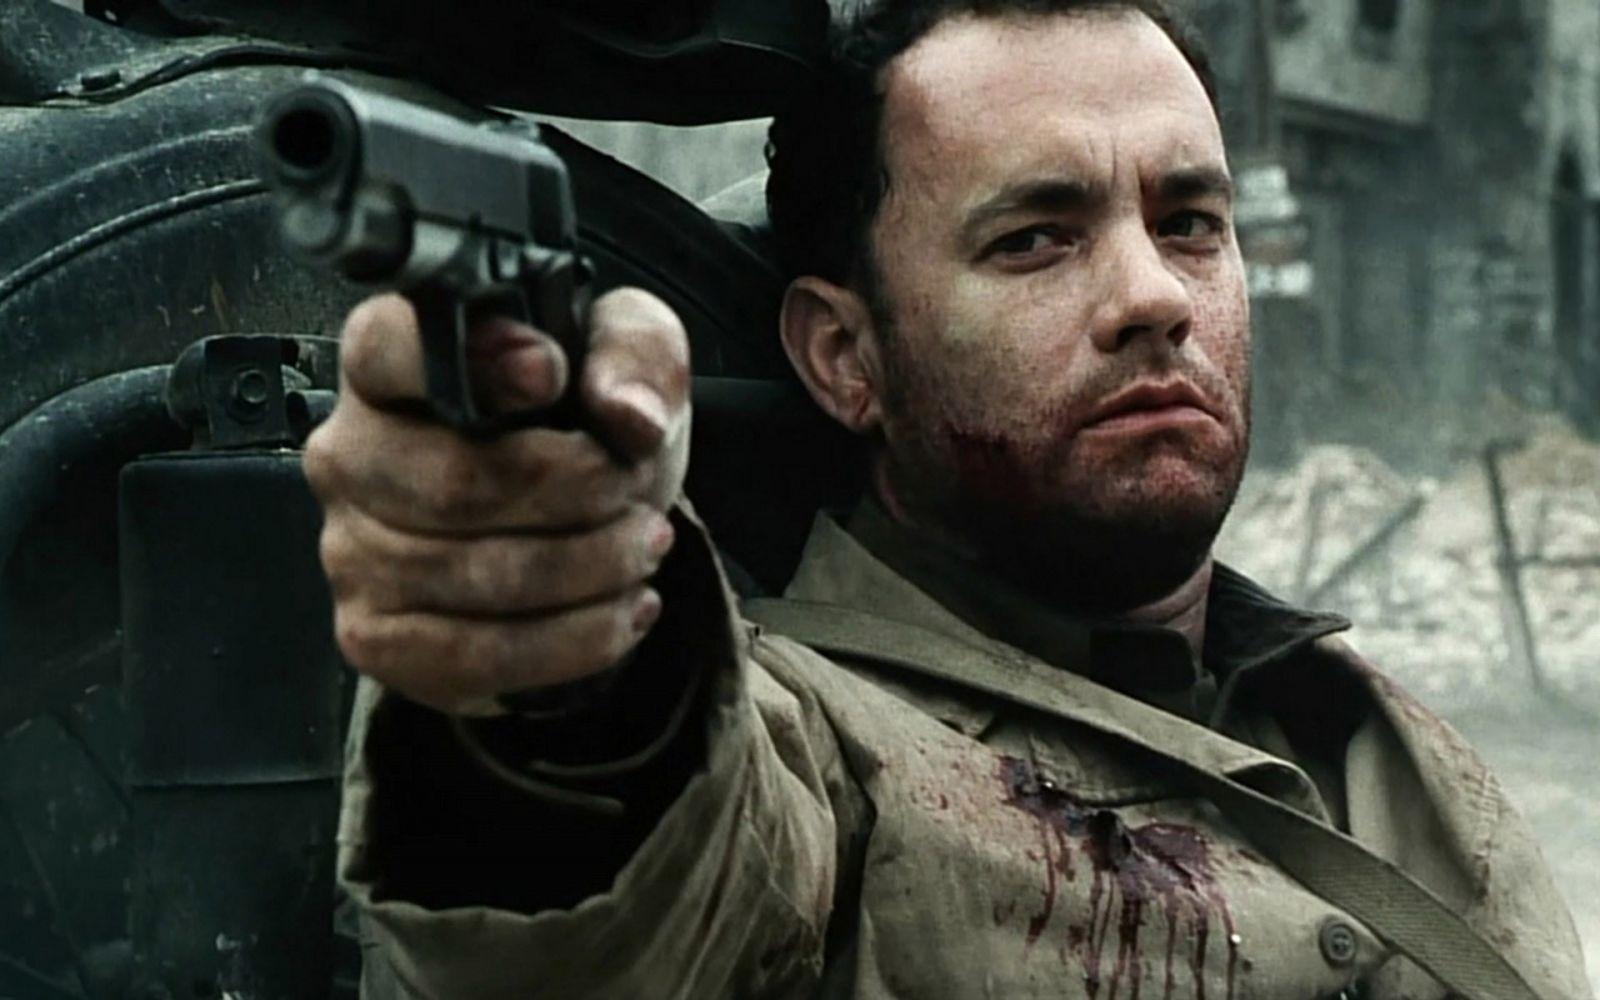 http://1.bp.blogspot.com/-MFTxLrMaTQU/T0Ze6anfdkI/AAAAAAAAFPw/YiOAVGEOW4Q/s1600/Tom-Hanks-Saving-Private-Ryan.jpg